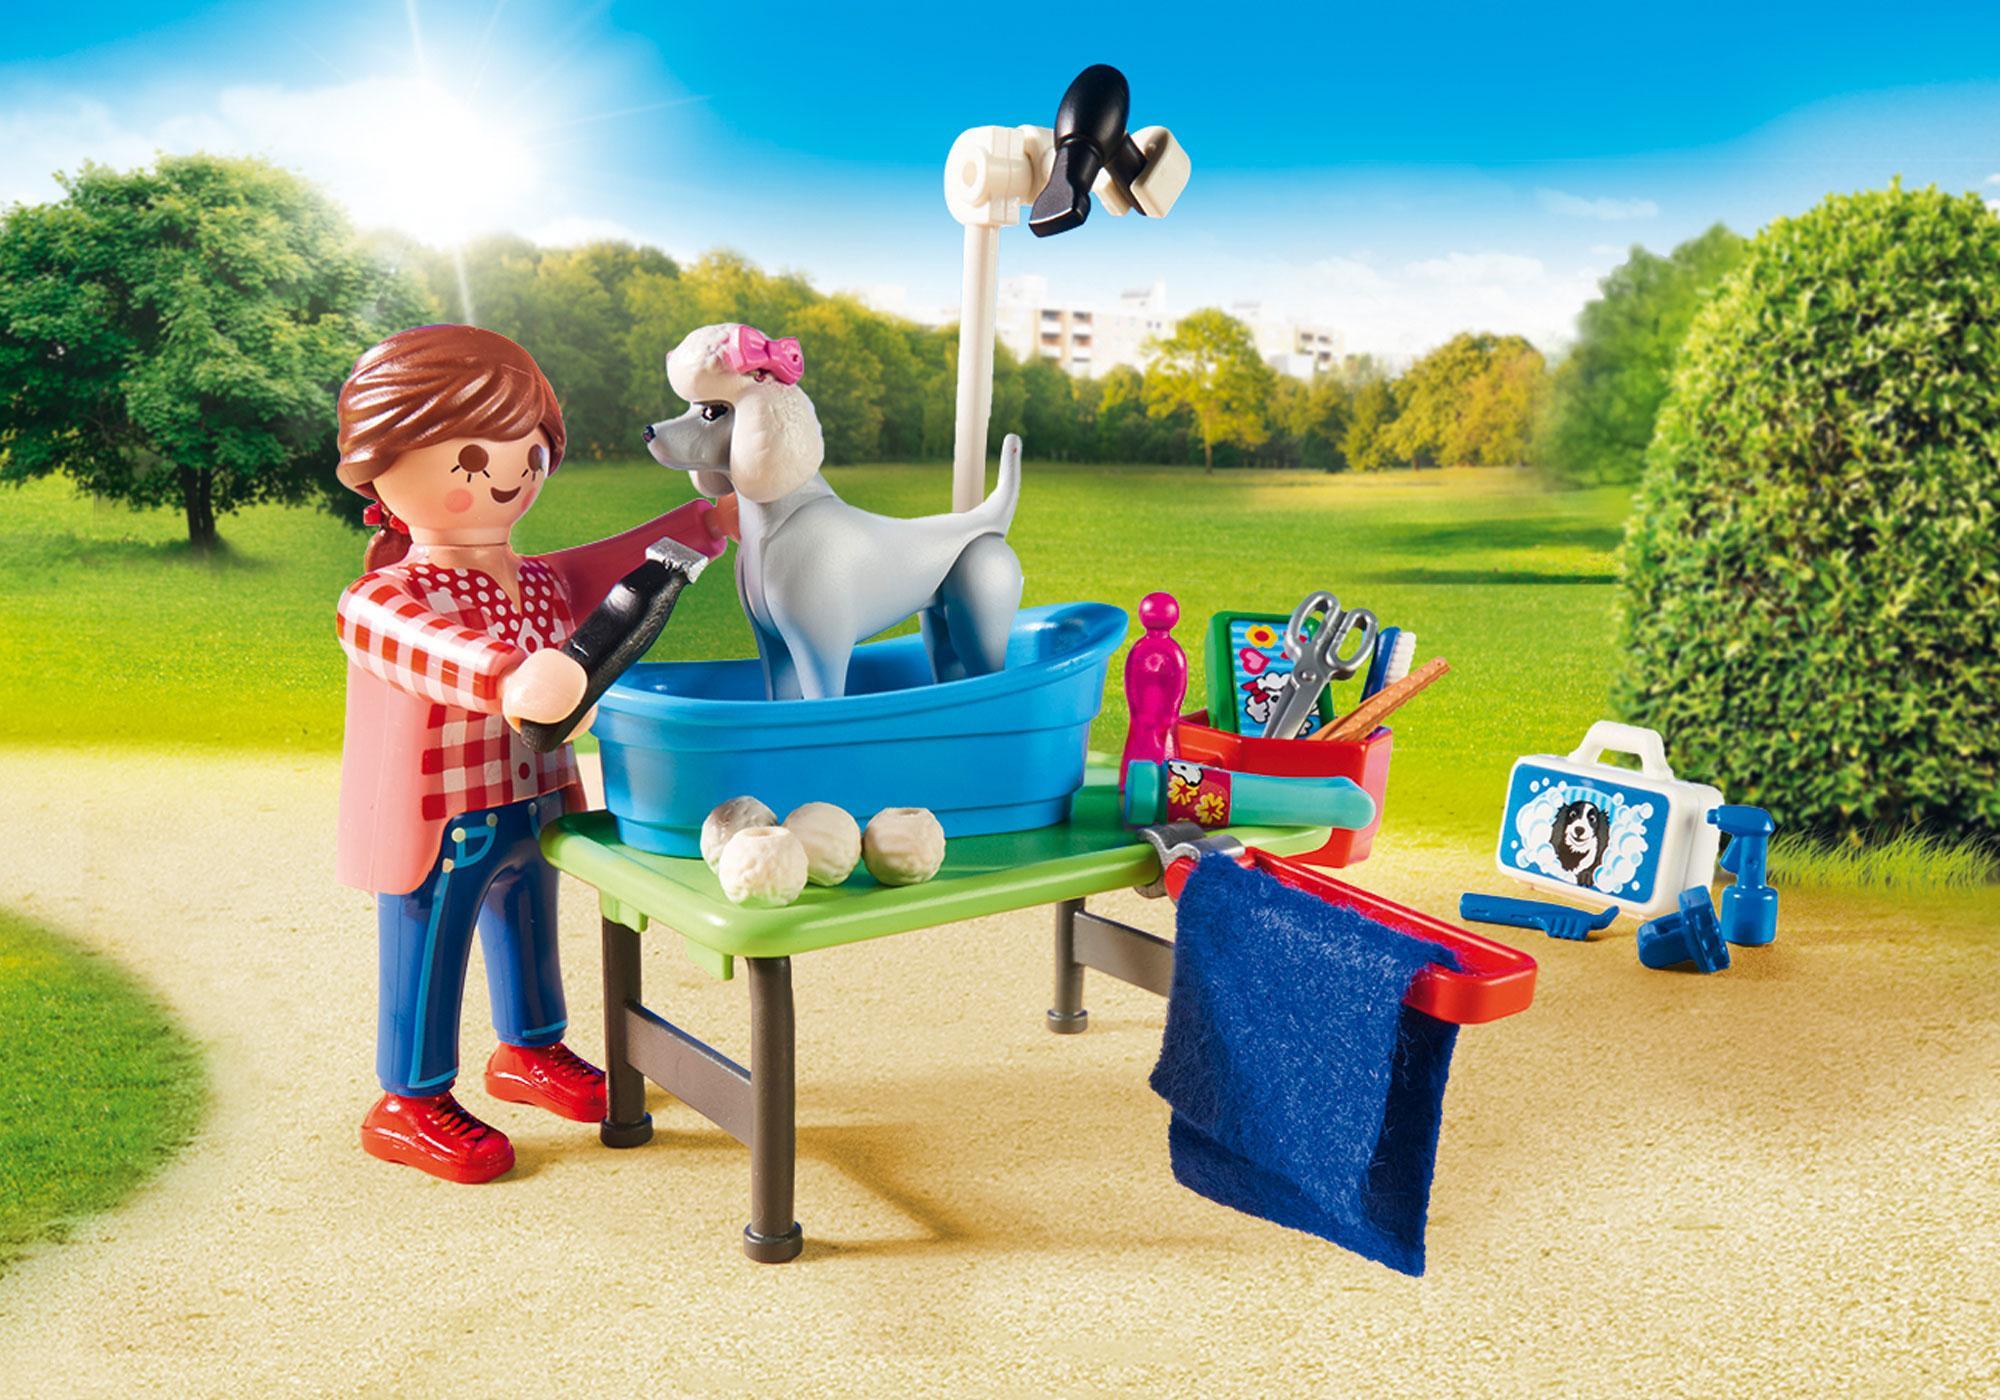 http://media.playmobil.com/i/playmobil/9278_product_extra2/Κινητή μονάδα κτηνιατρικής φροντίδας